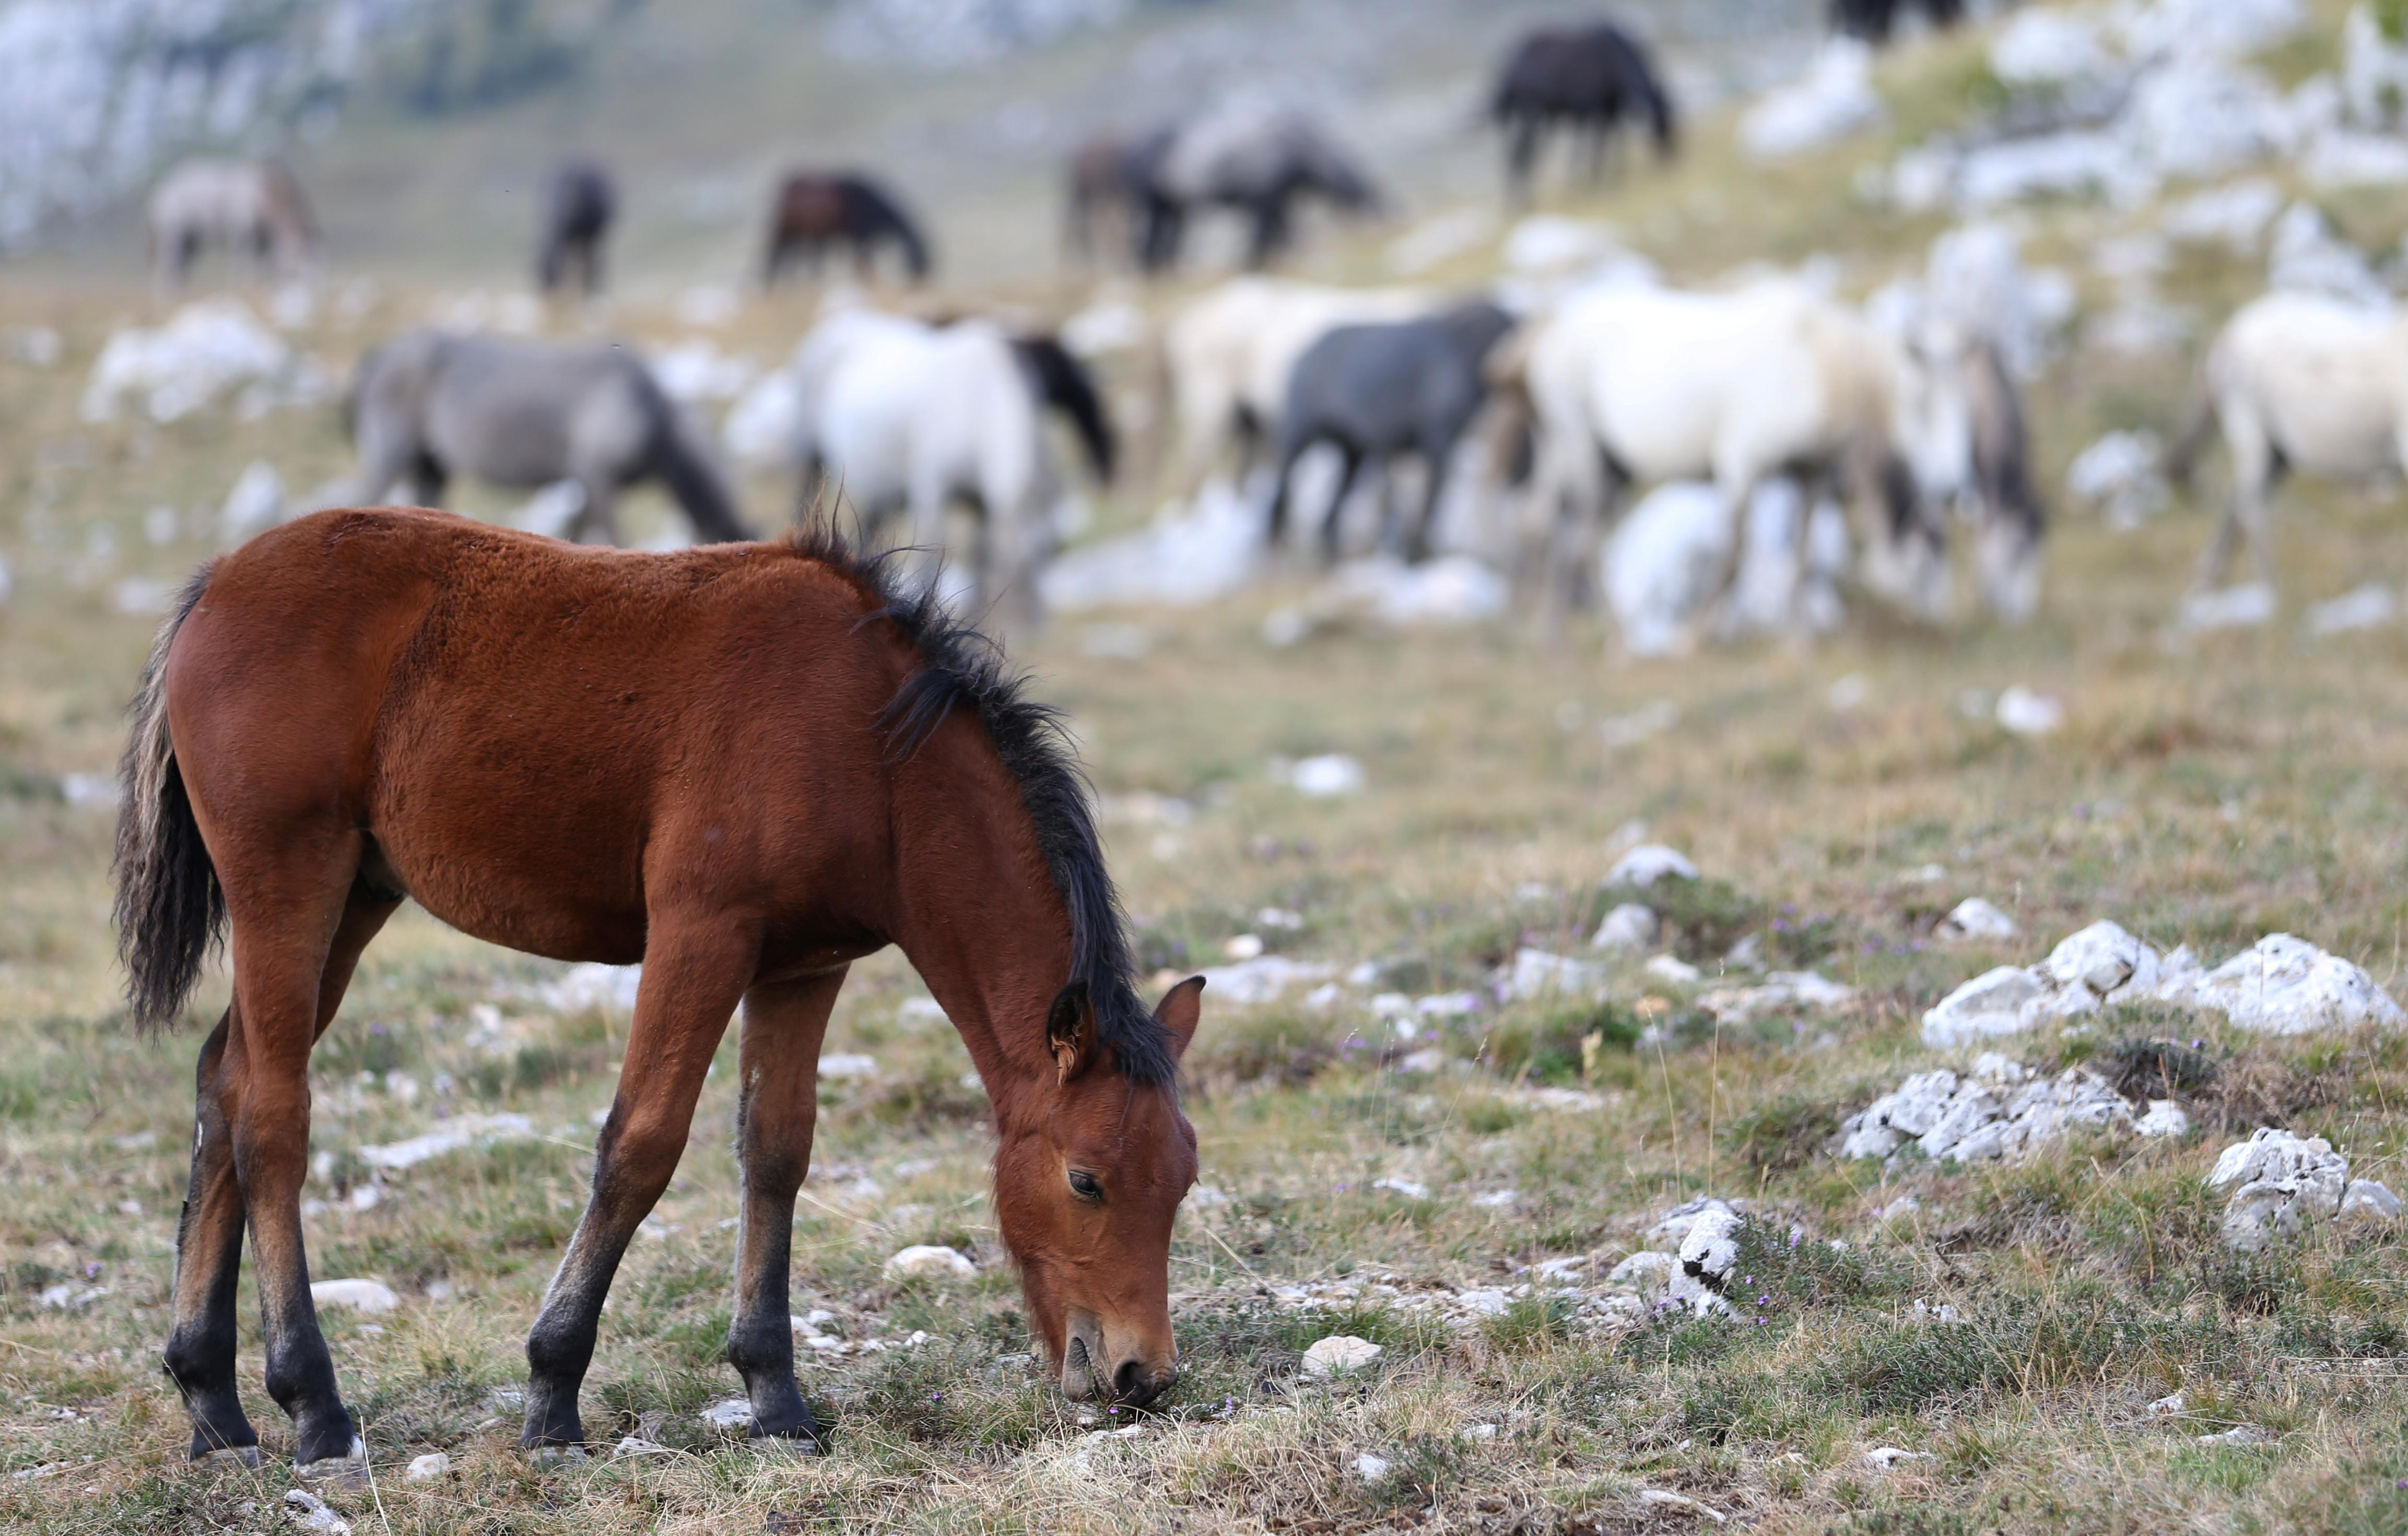 Wild horses graze the grass on Cincar Mountain near Livno, Bosnia and Herzegovina September 13, 2021. REUTERS/Dado Ruvic